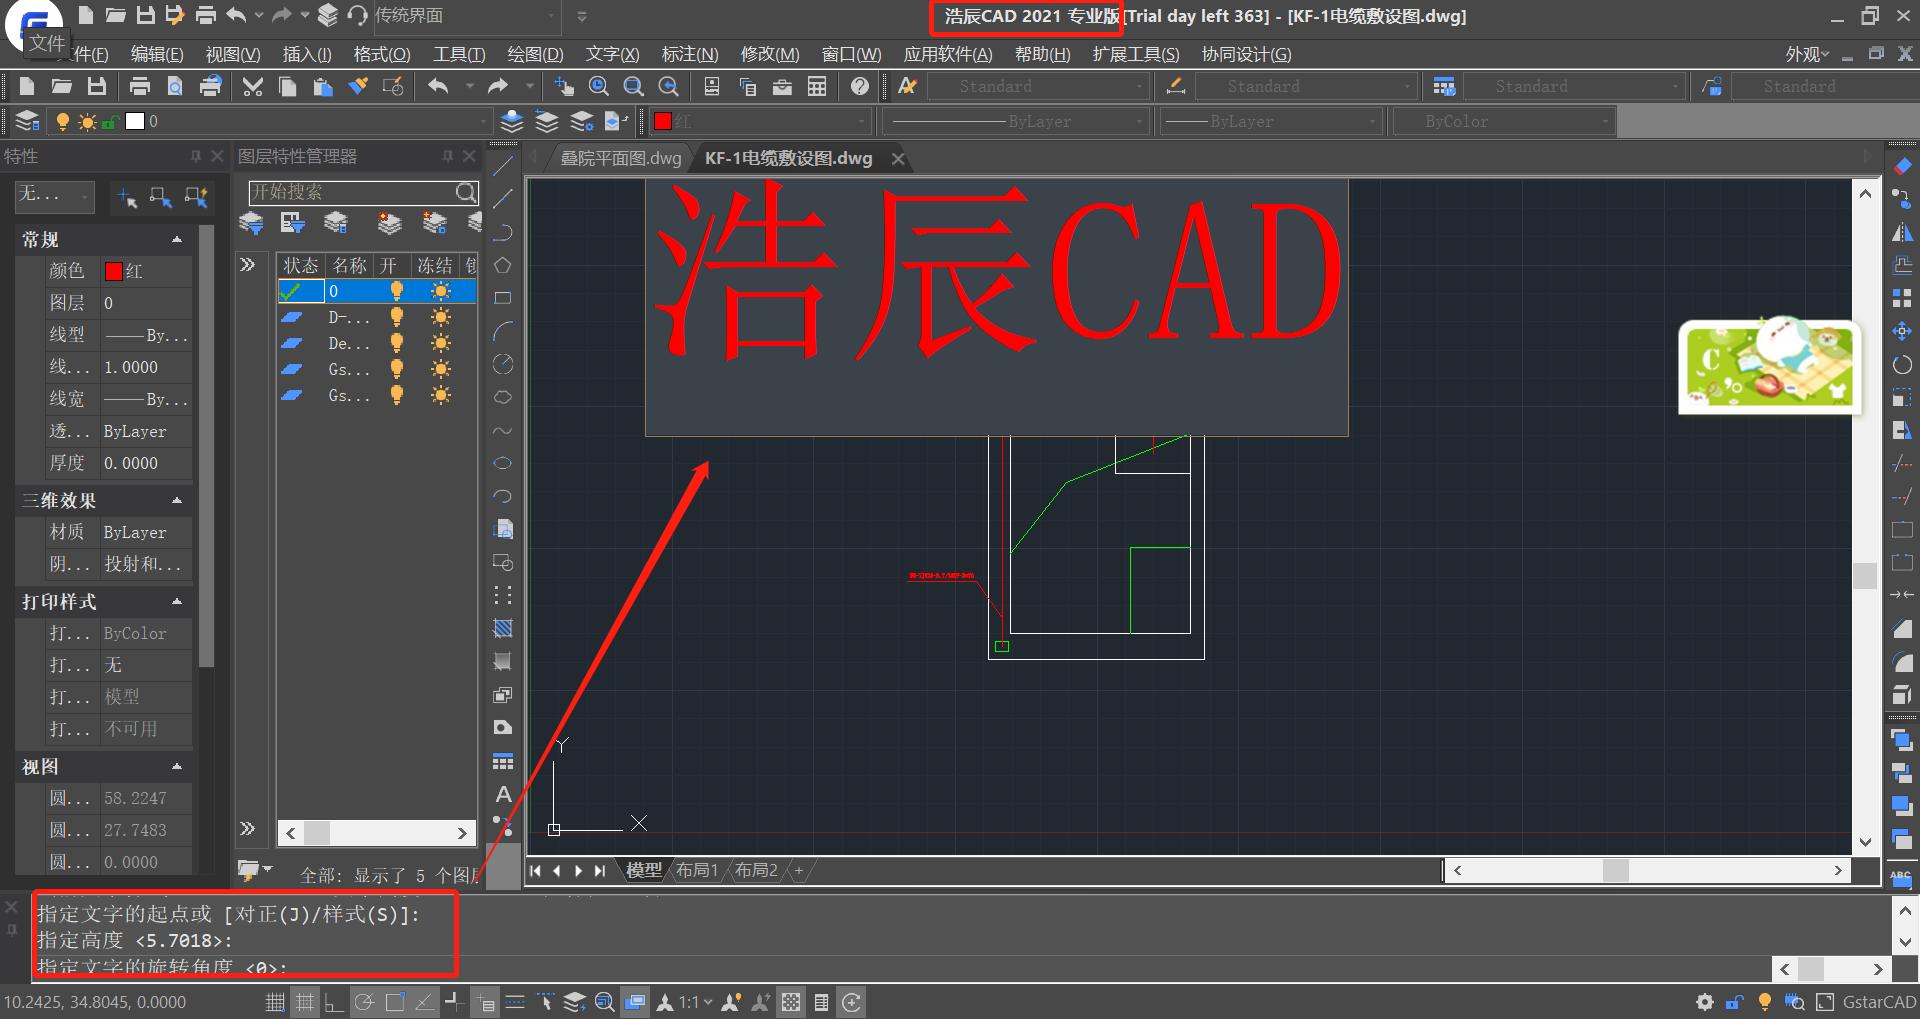 CAD中怎么输入文字?CAD单行文字输入技巧